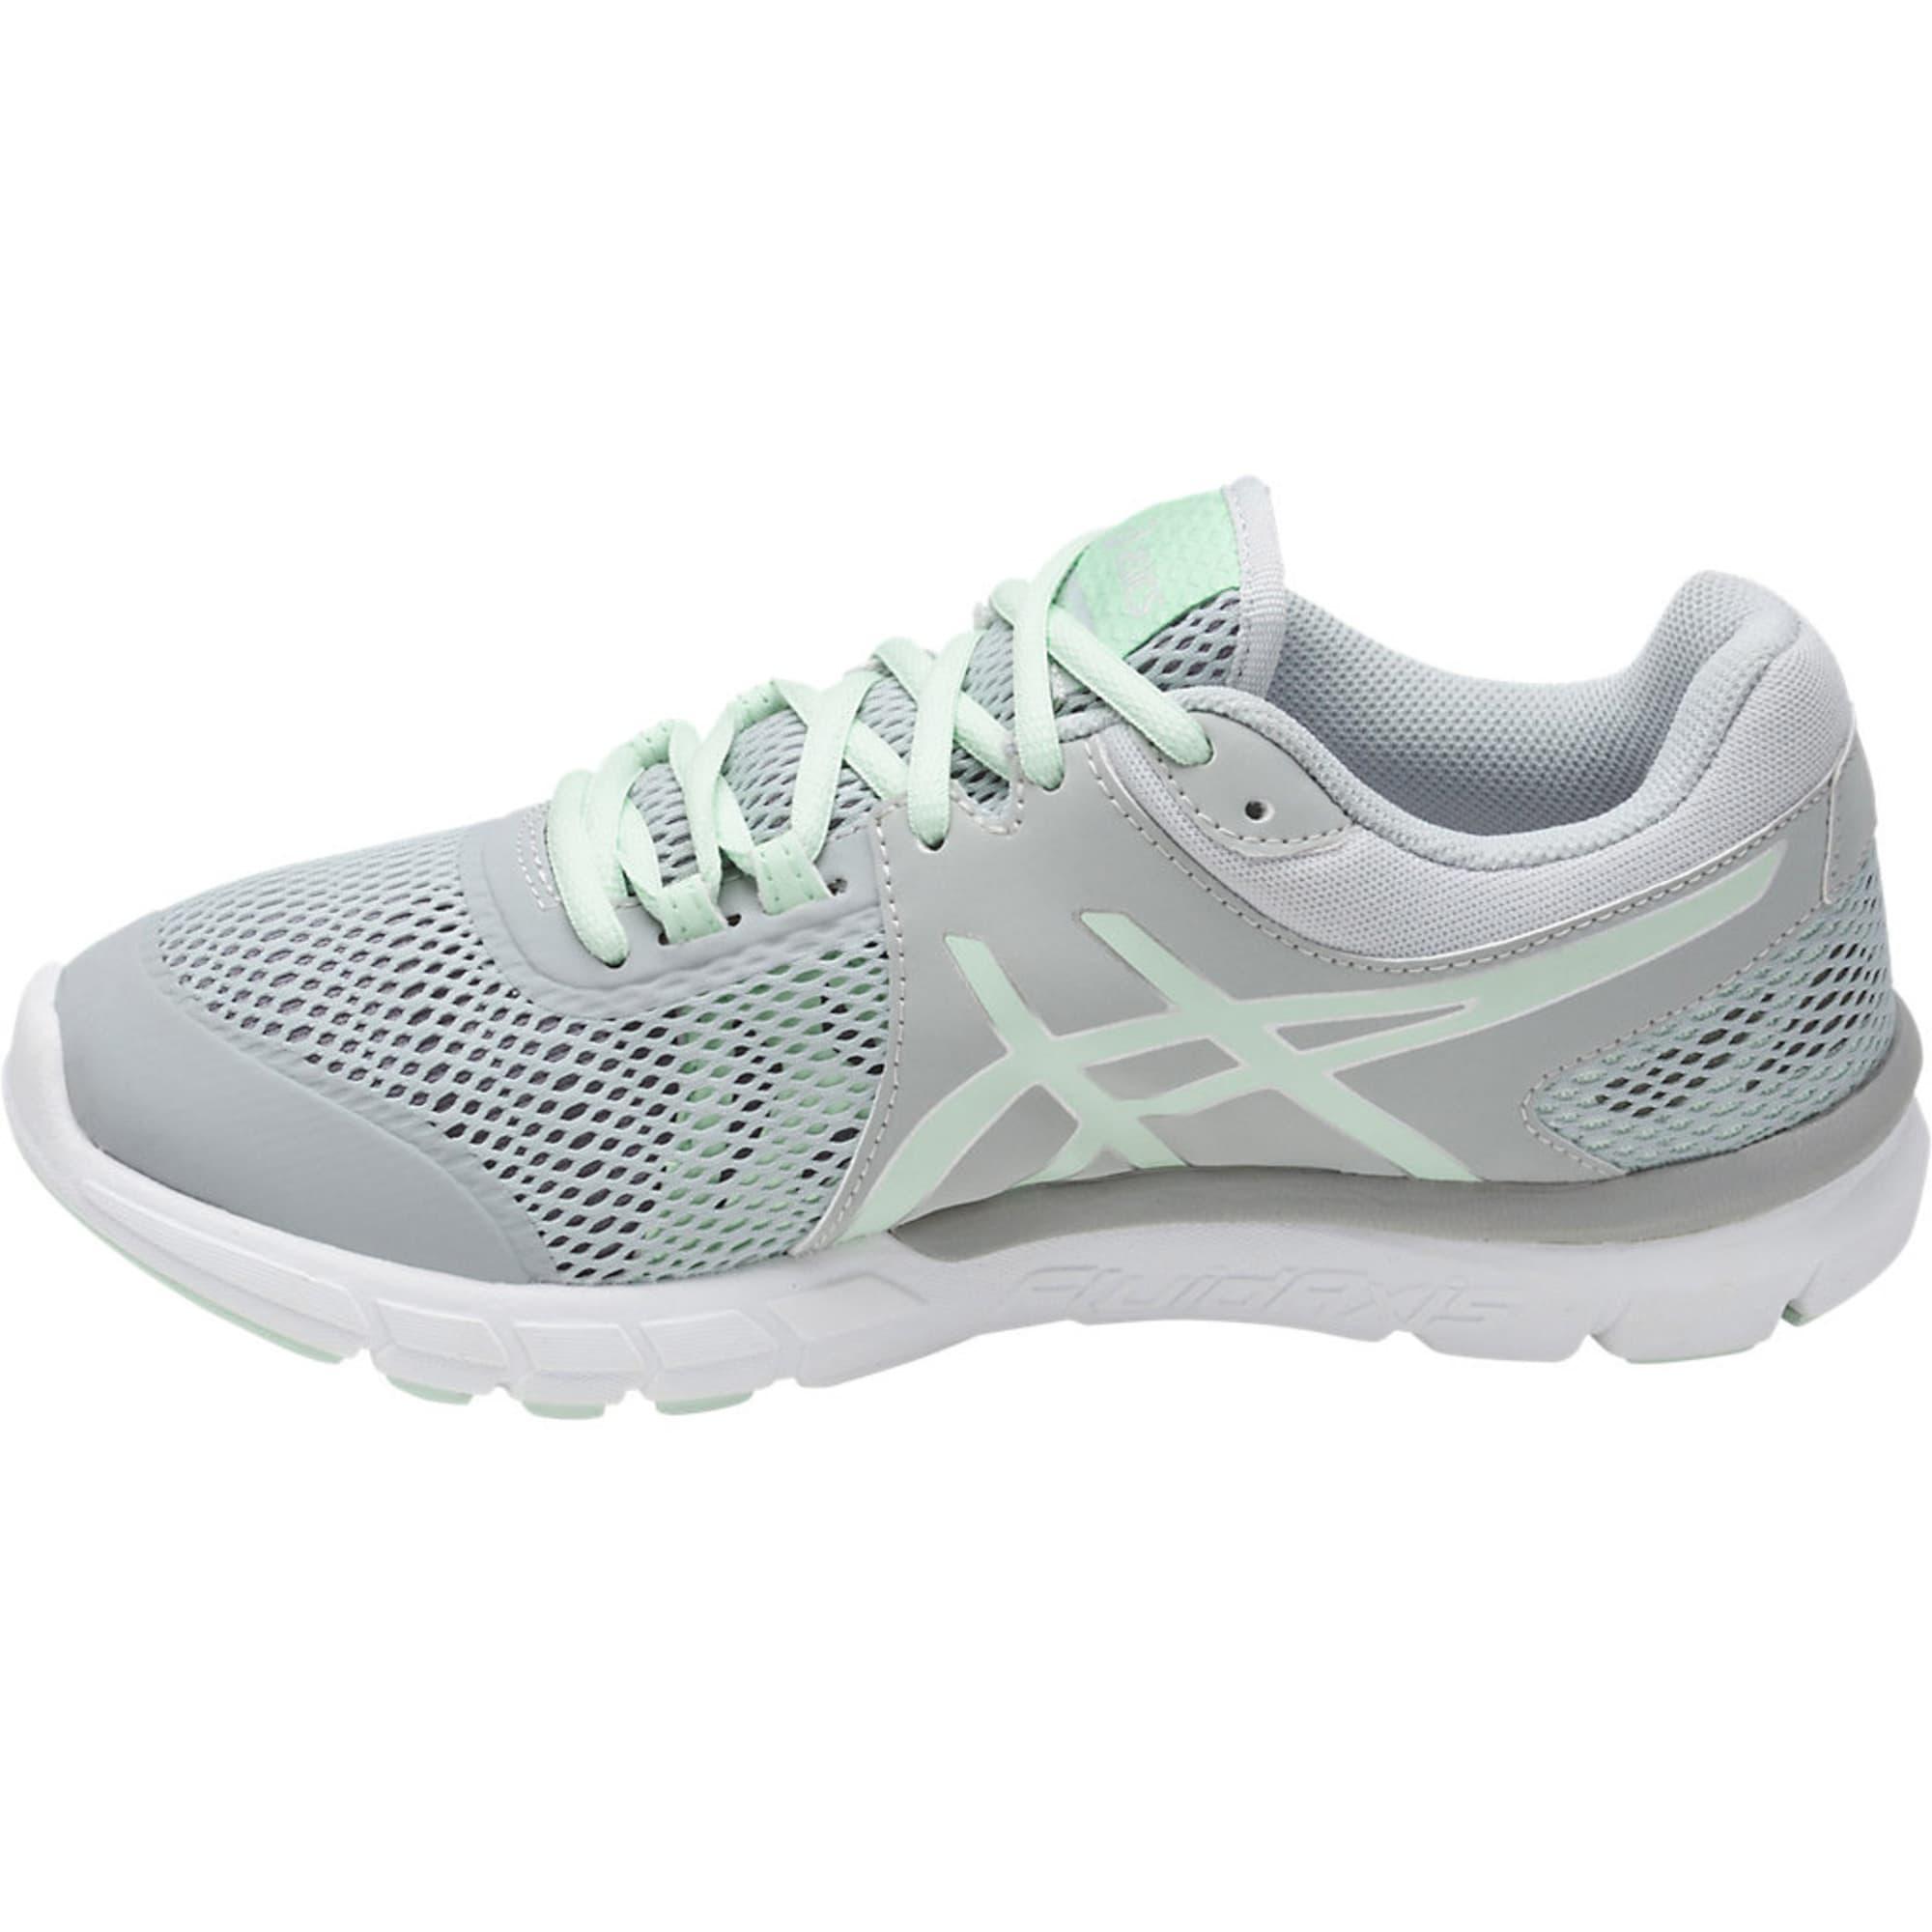 Gel Craze TR 4 Training Shoes